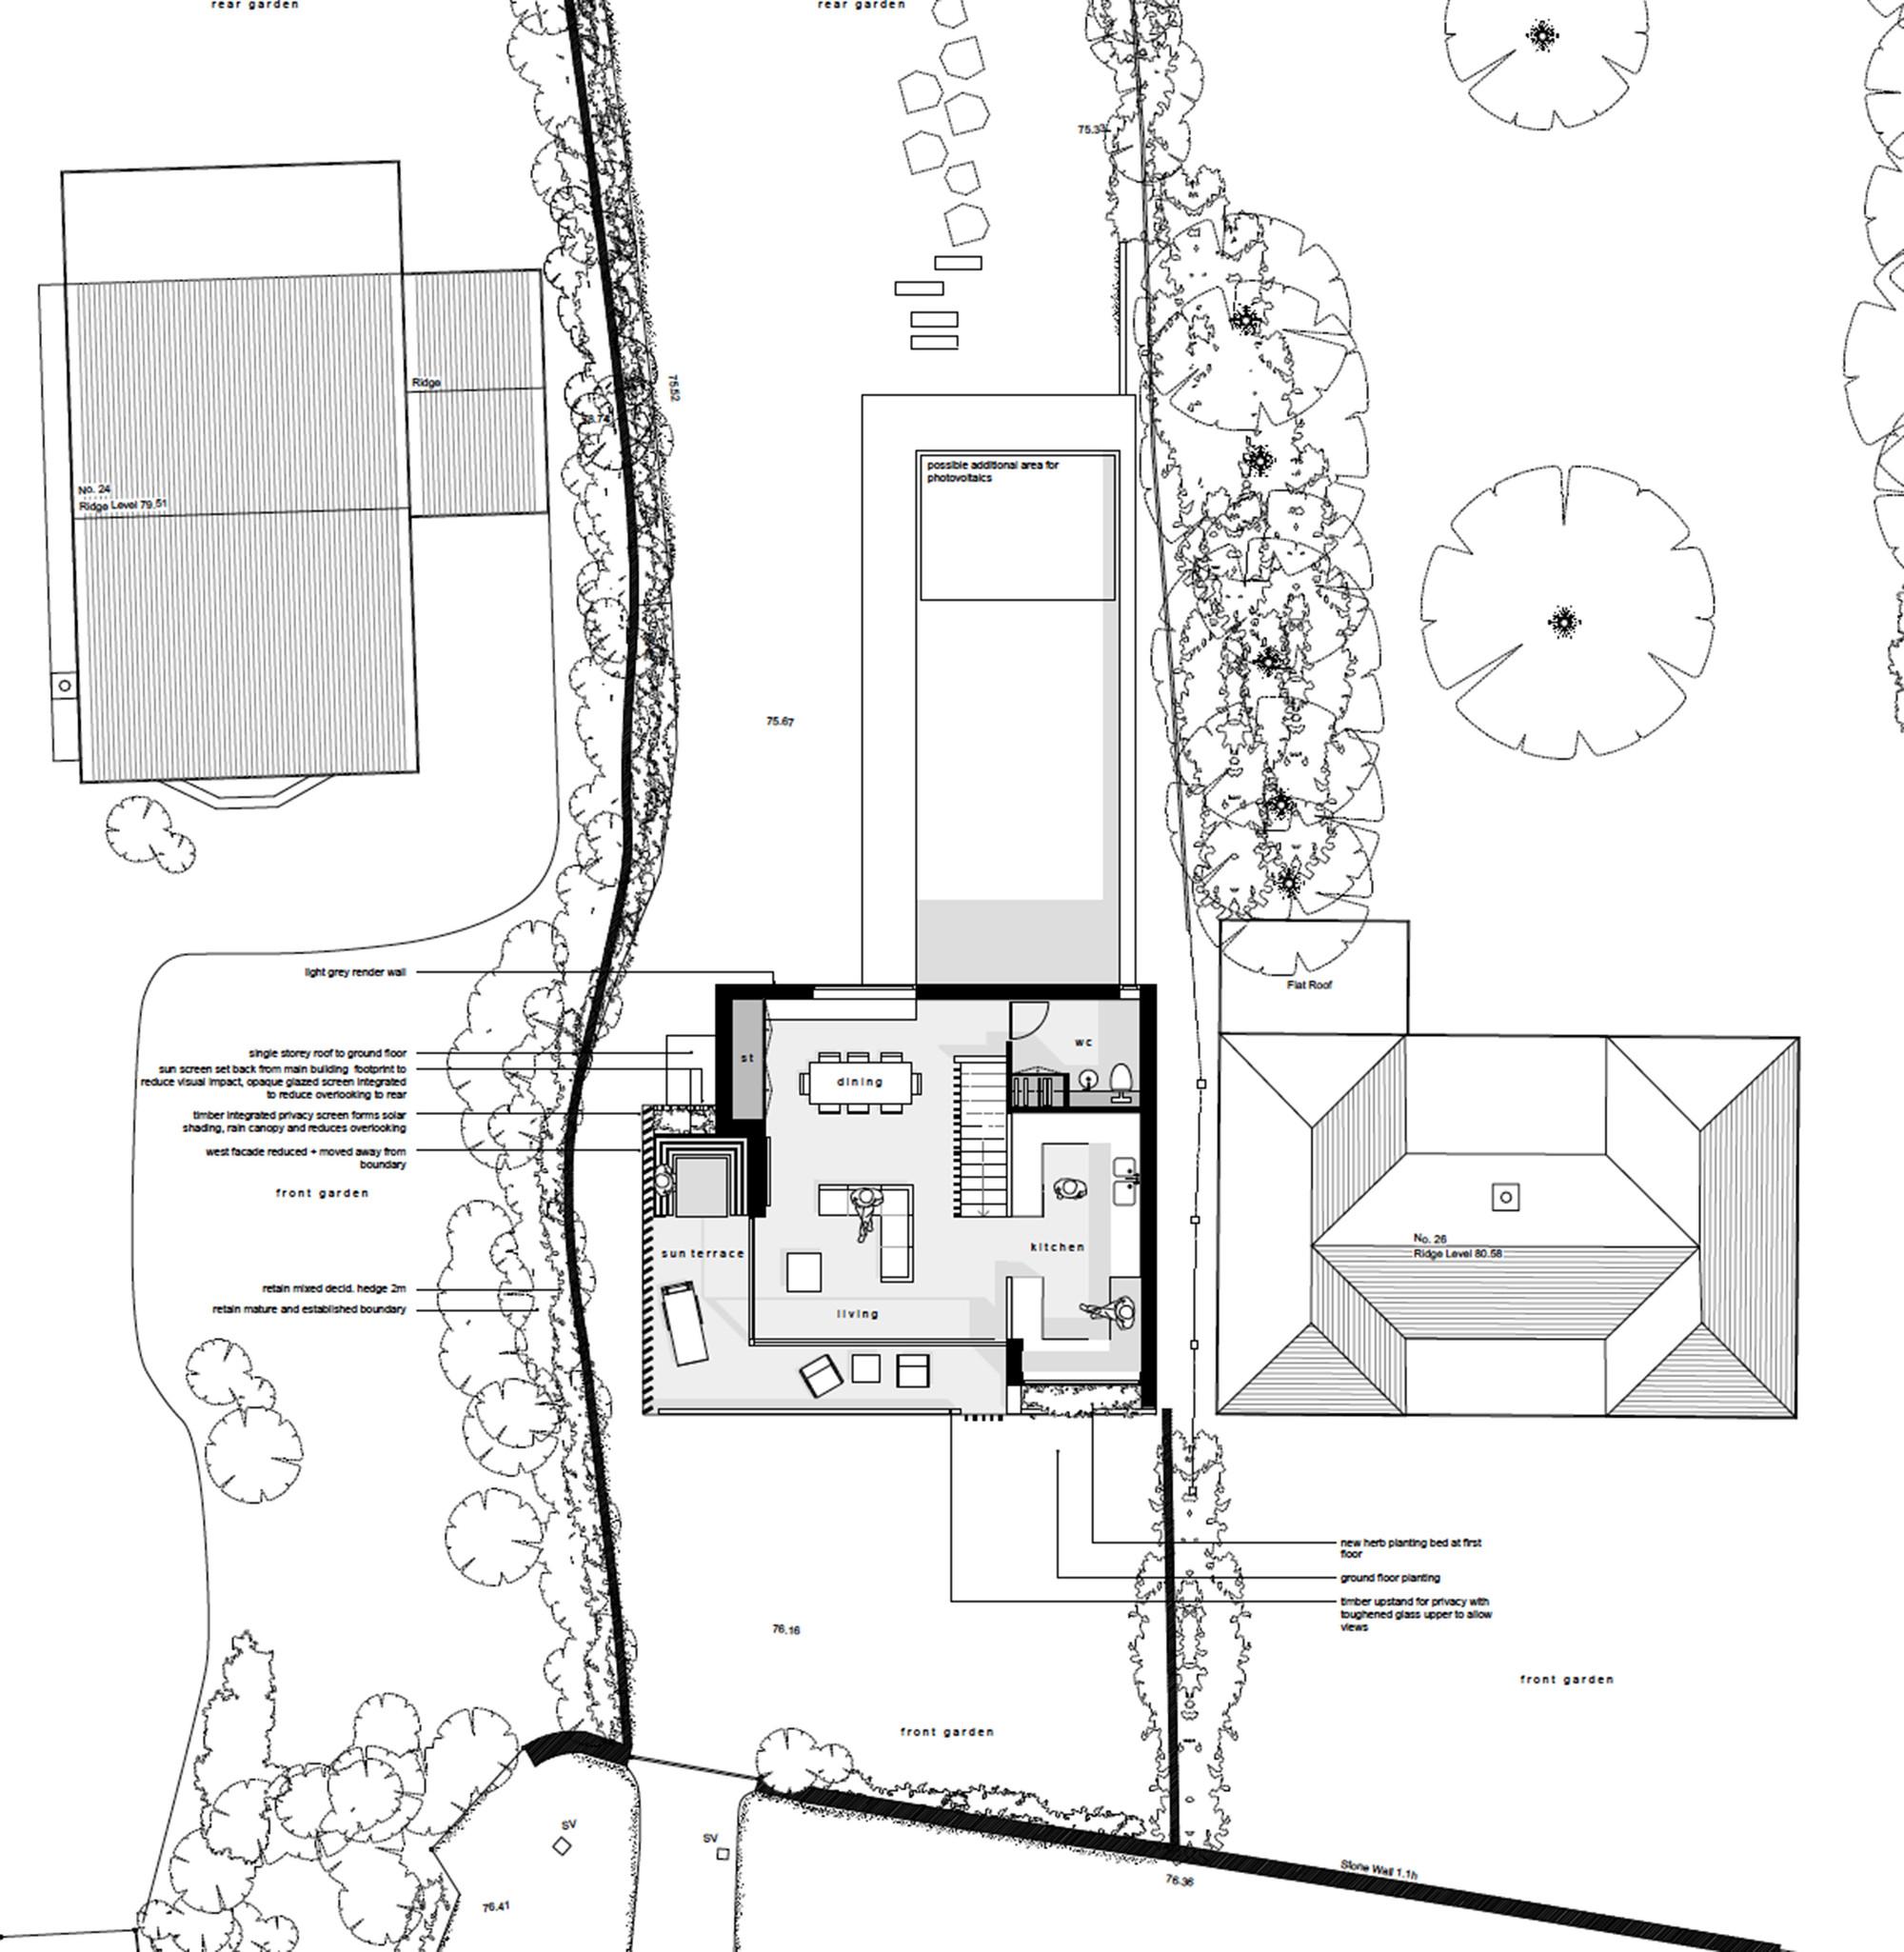 Galer a de casa cliff hyde hyde architects 15 for Hyde homes floor plans